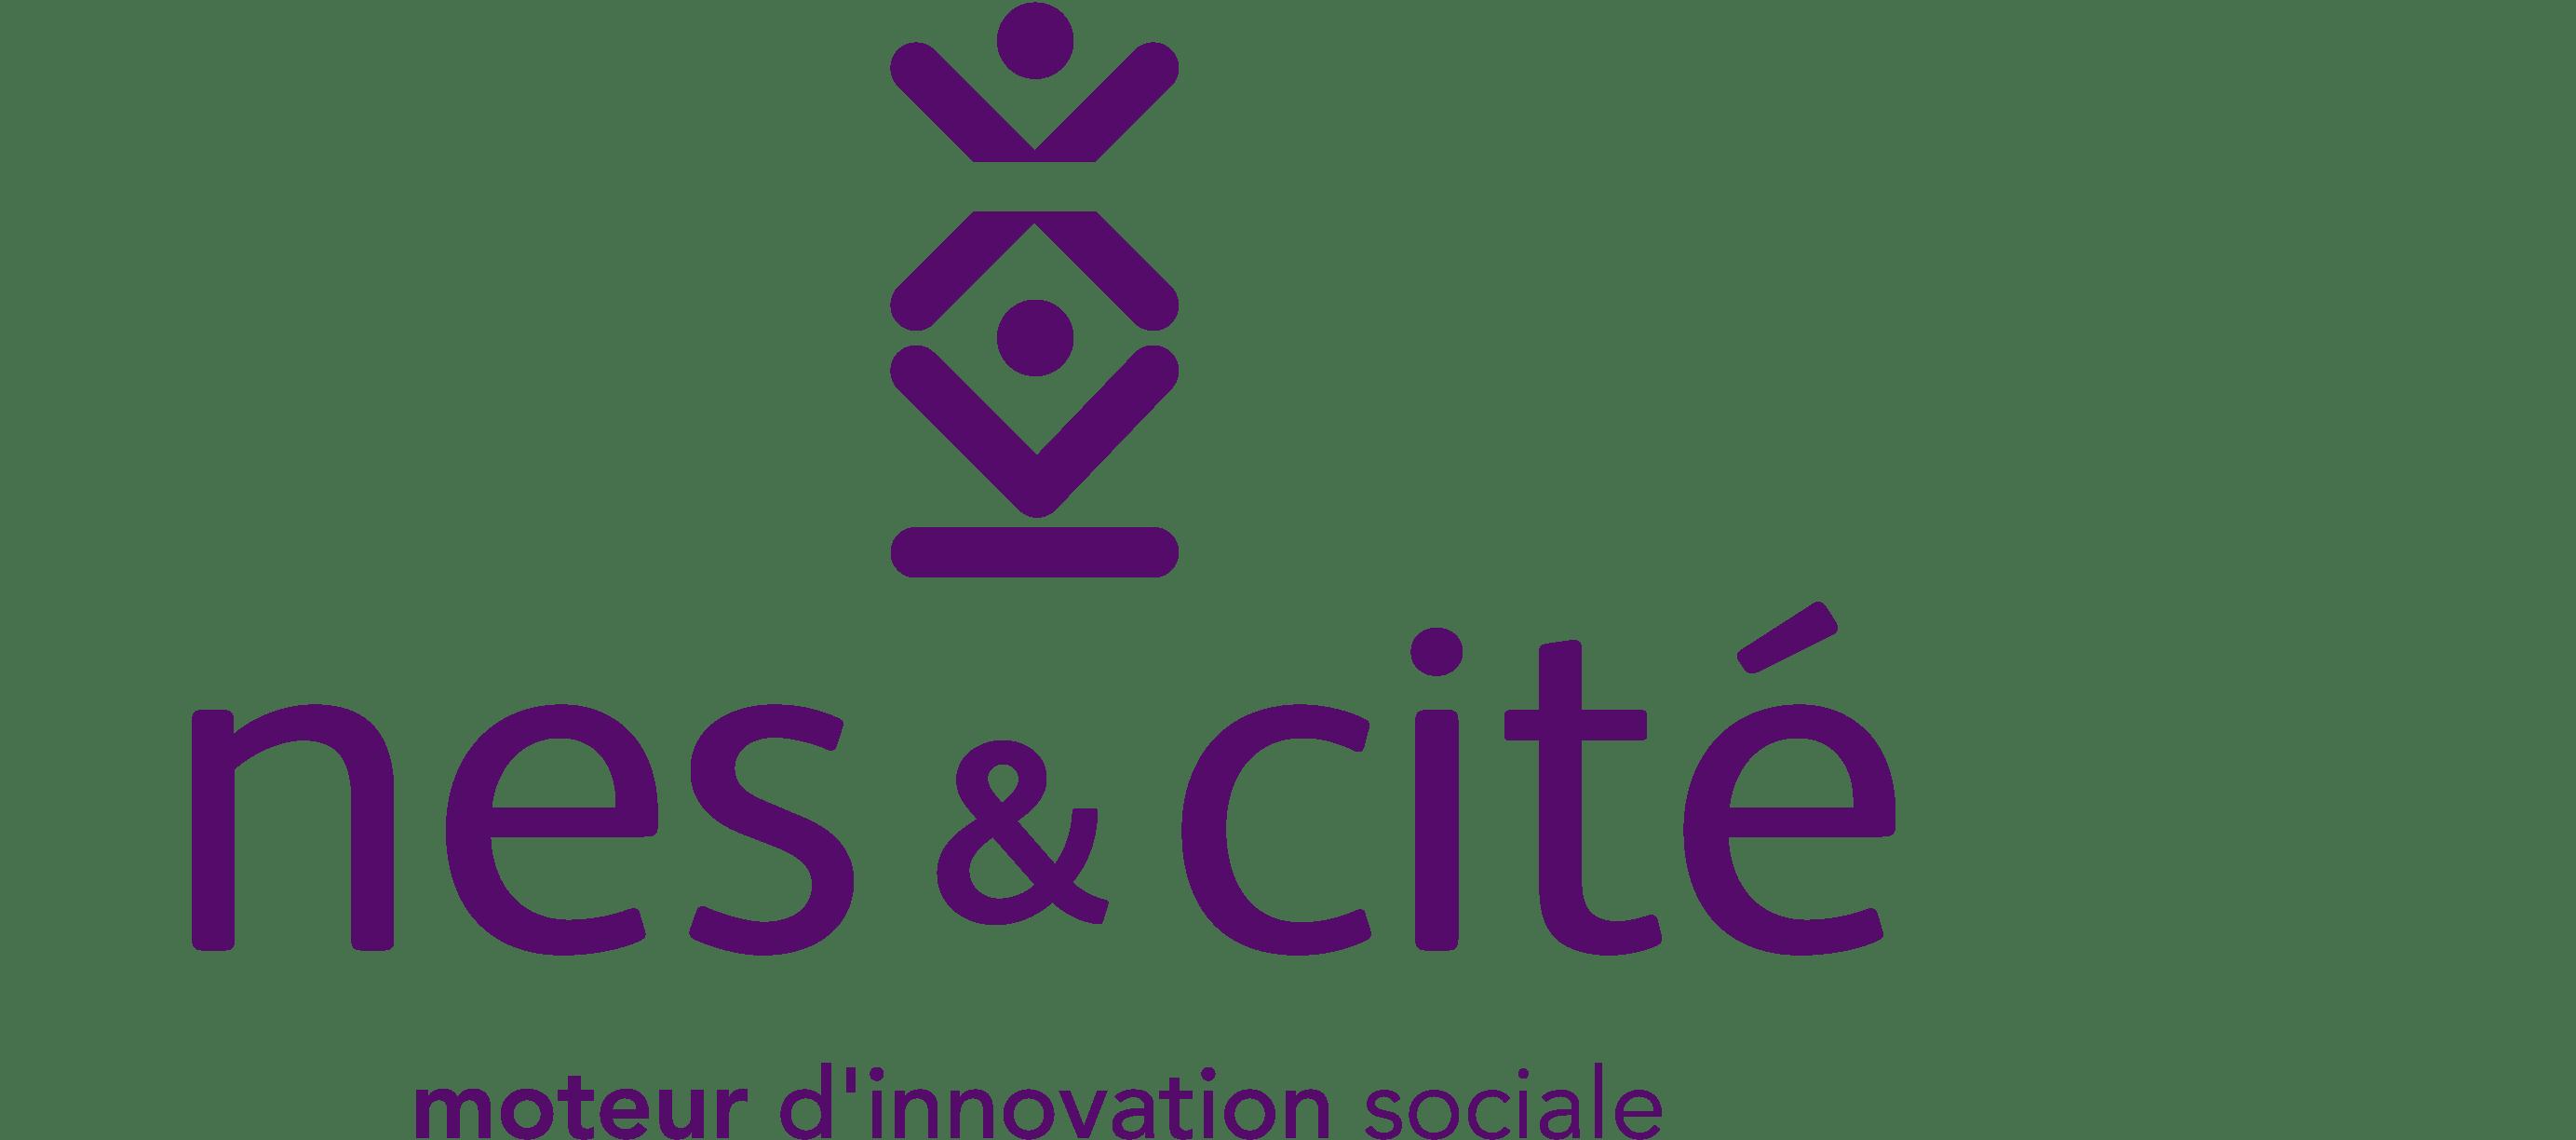 cropped-Logo-avec-marge-lateral_Plan-de-travail-1-3.png